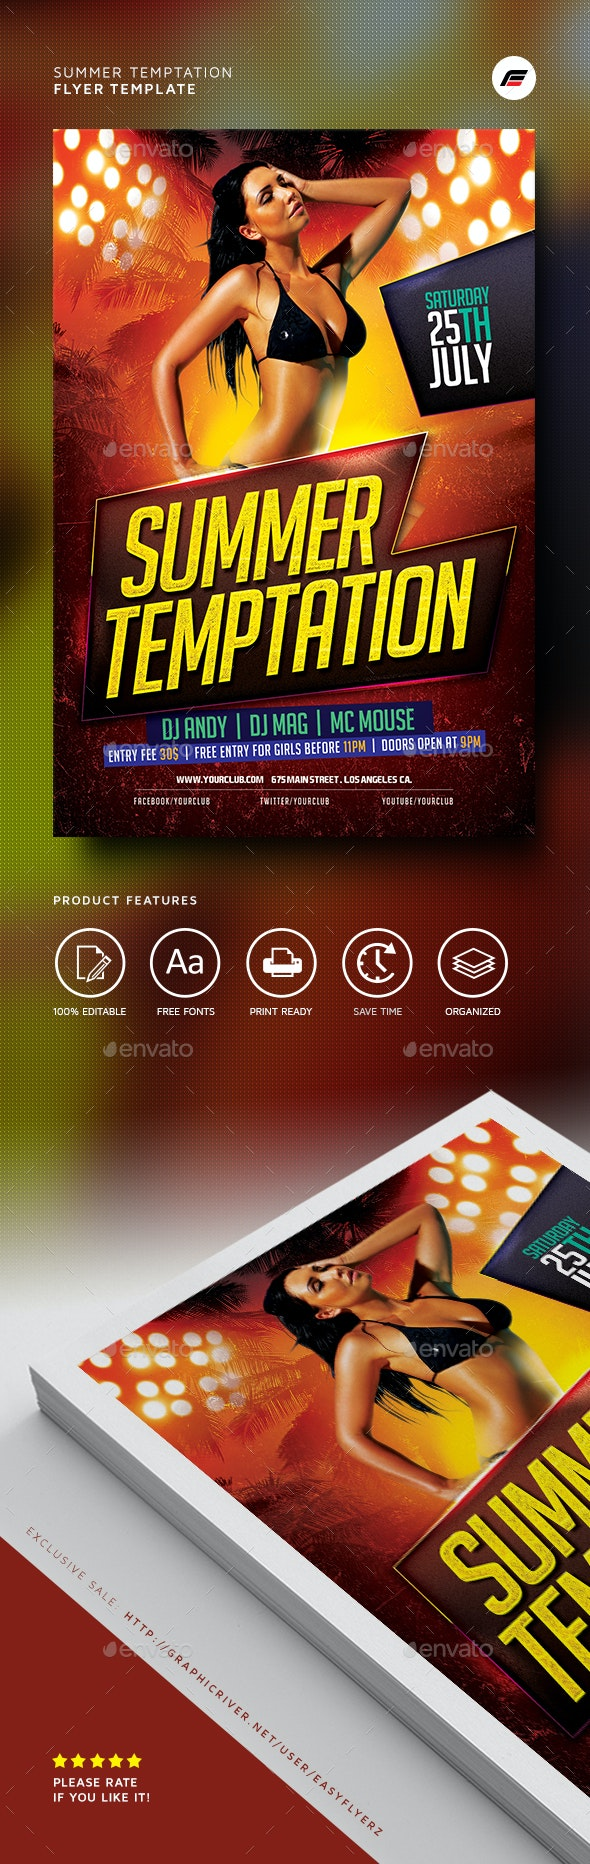 Summer Temptation Flyer Template - Events Flyers